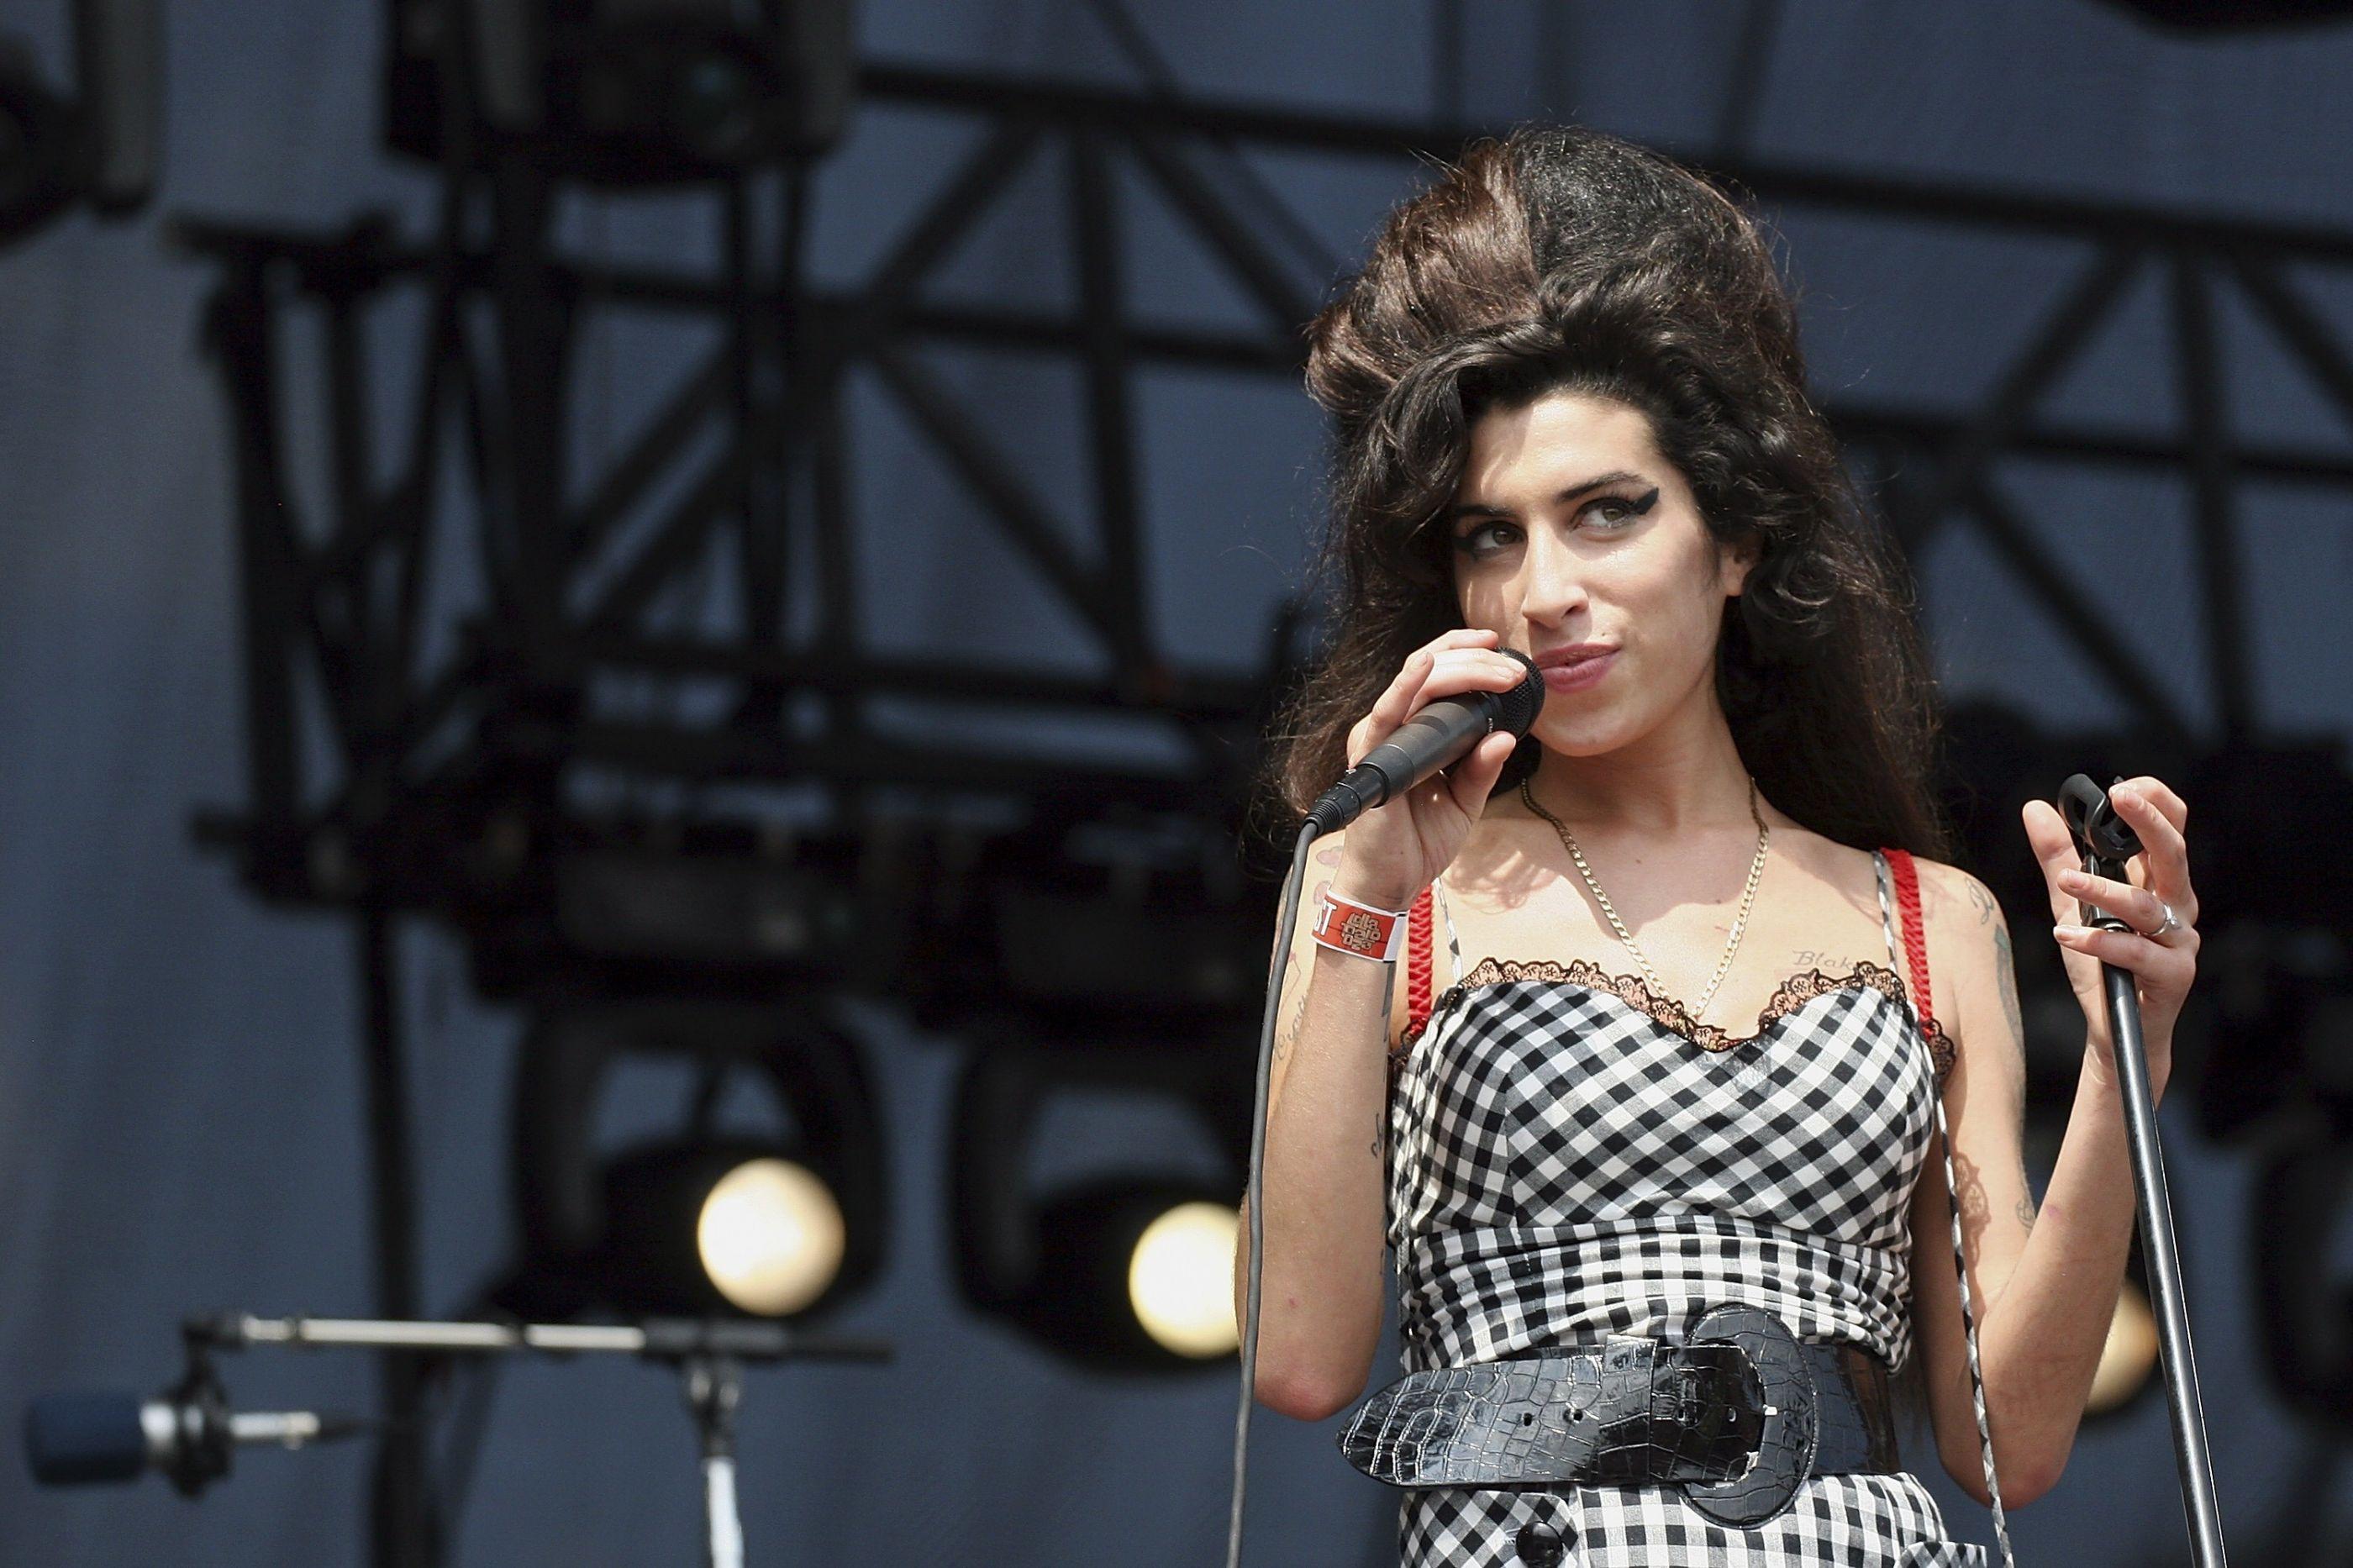 Amy Winehouse voltará aos palcos na forma de holograma